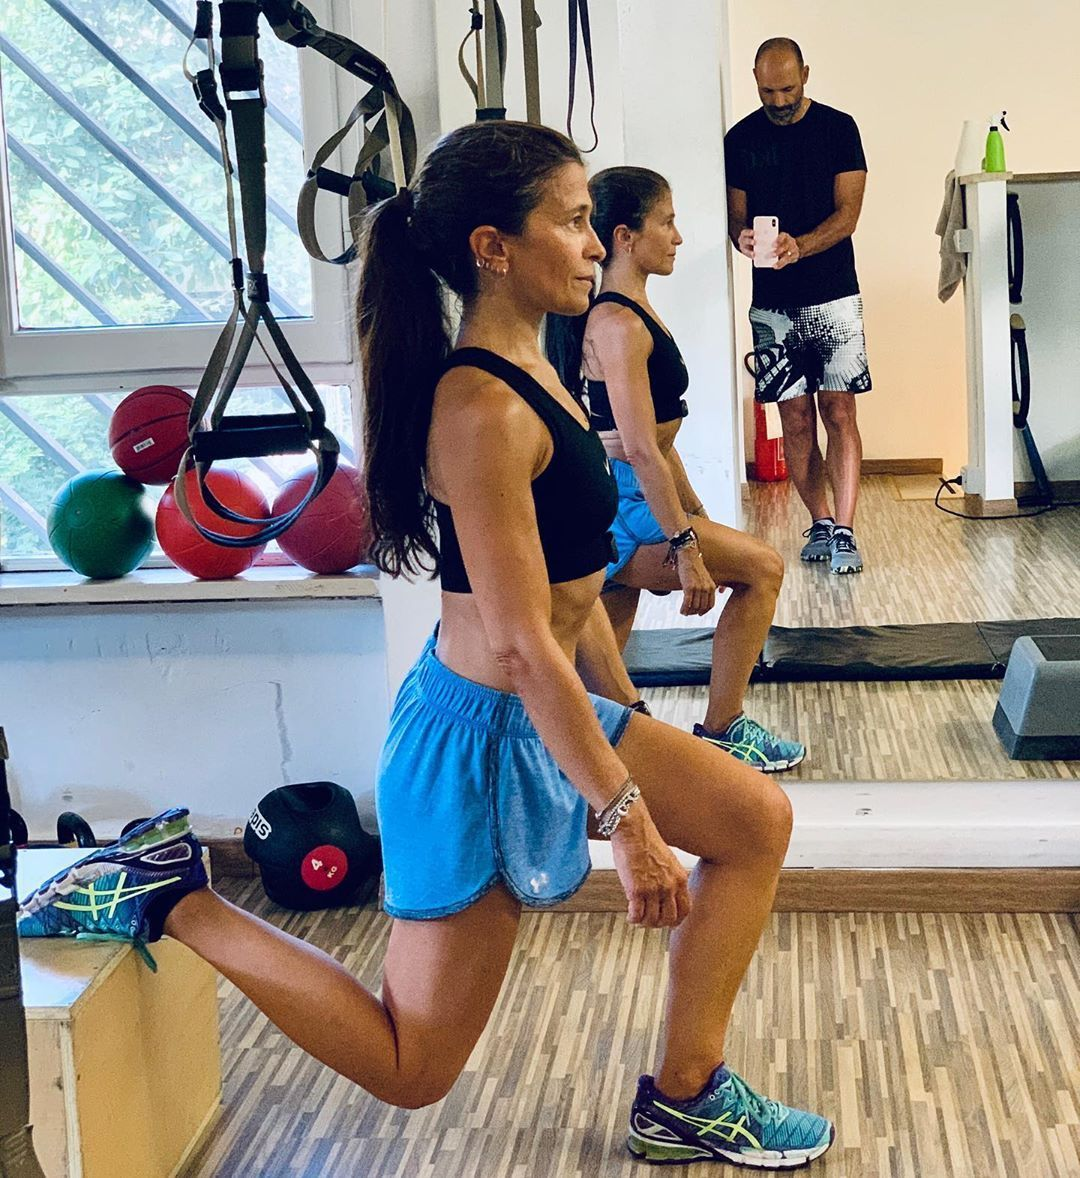 9 00 10 00 Functional Training Pilatesromaeur Functionaltraining Fitness Functional Training Strength Training For Beginners Bodyweight Strength Training